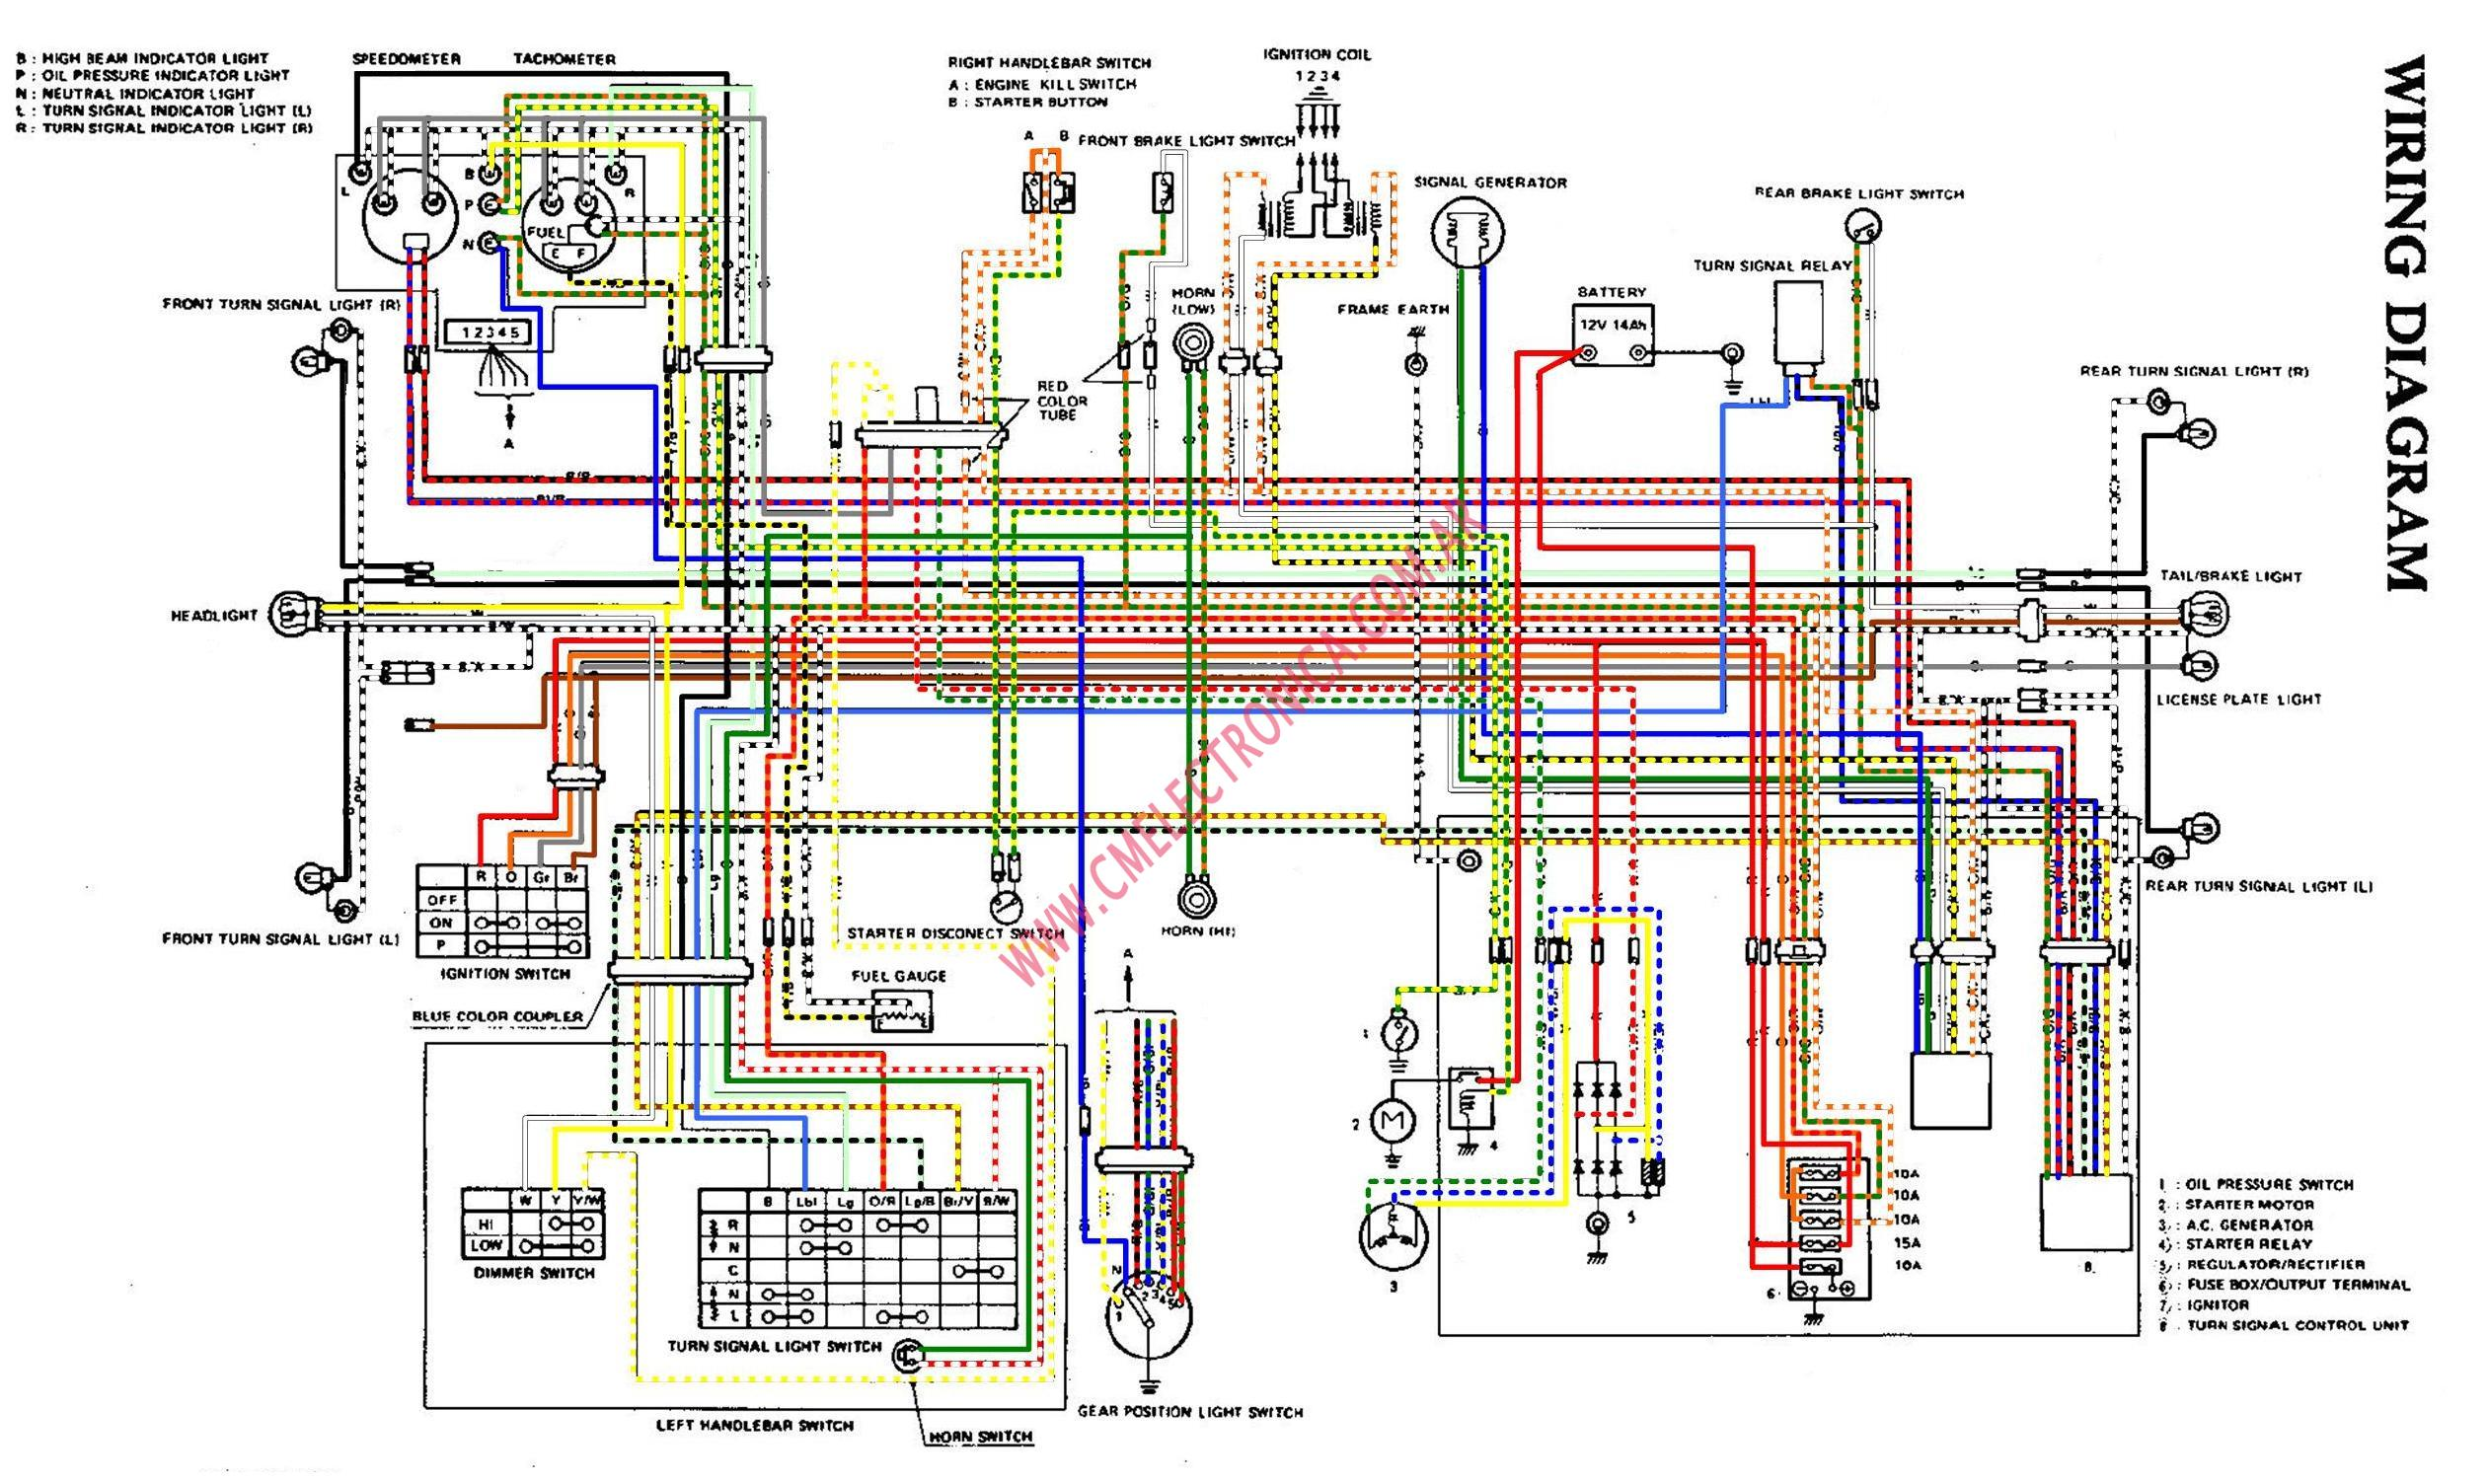 2007 Suzuki M50 Wiring Diagram Electrical Diagrams Yamaha Fz8 Vz800 Database Intruder 1400